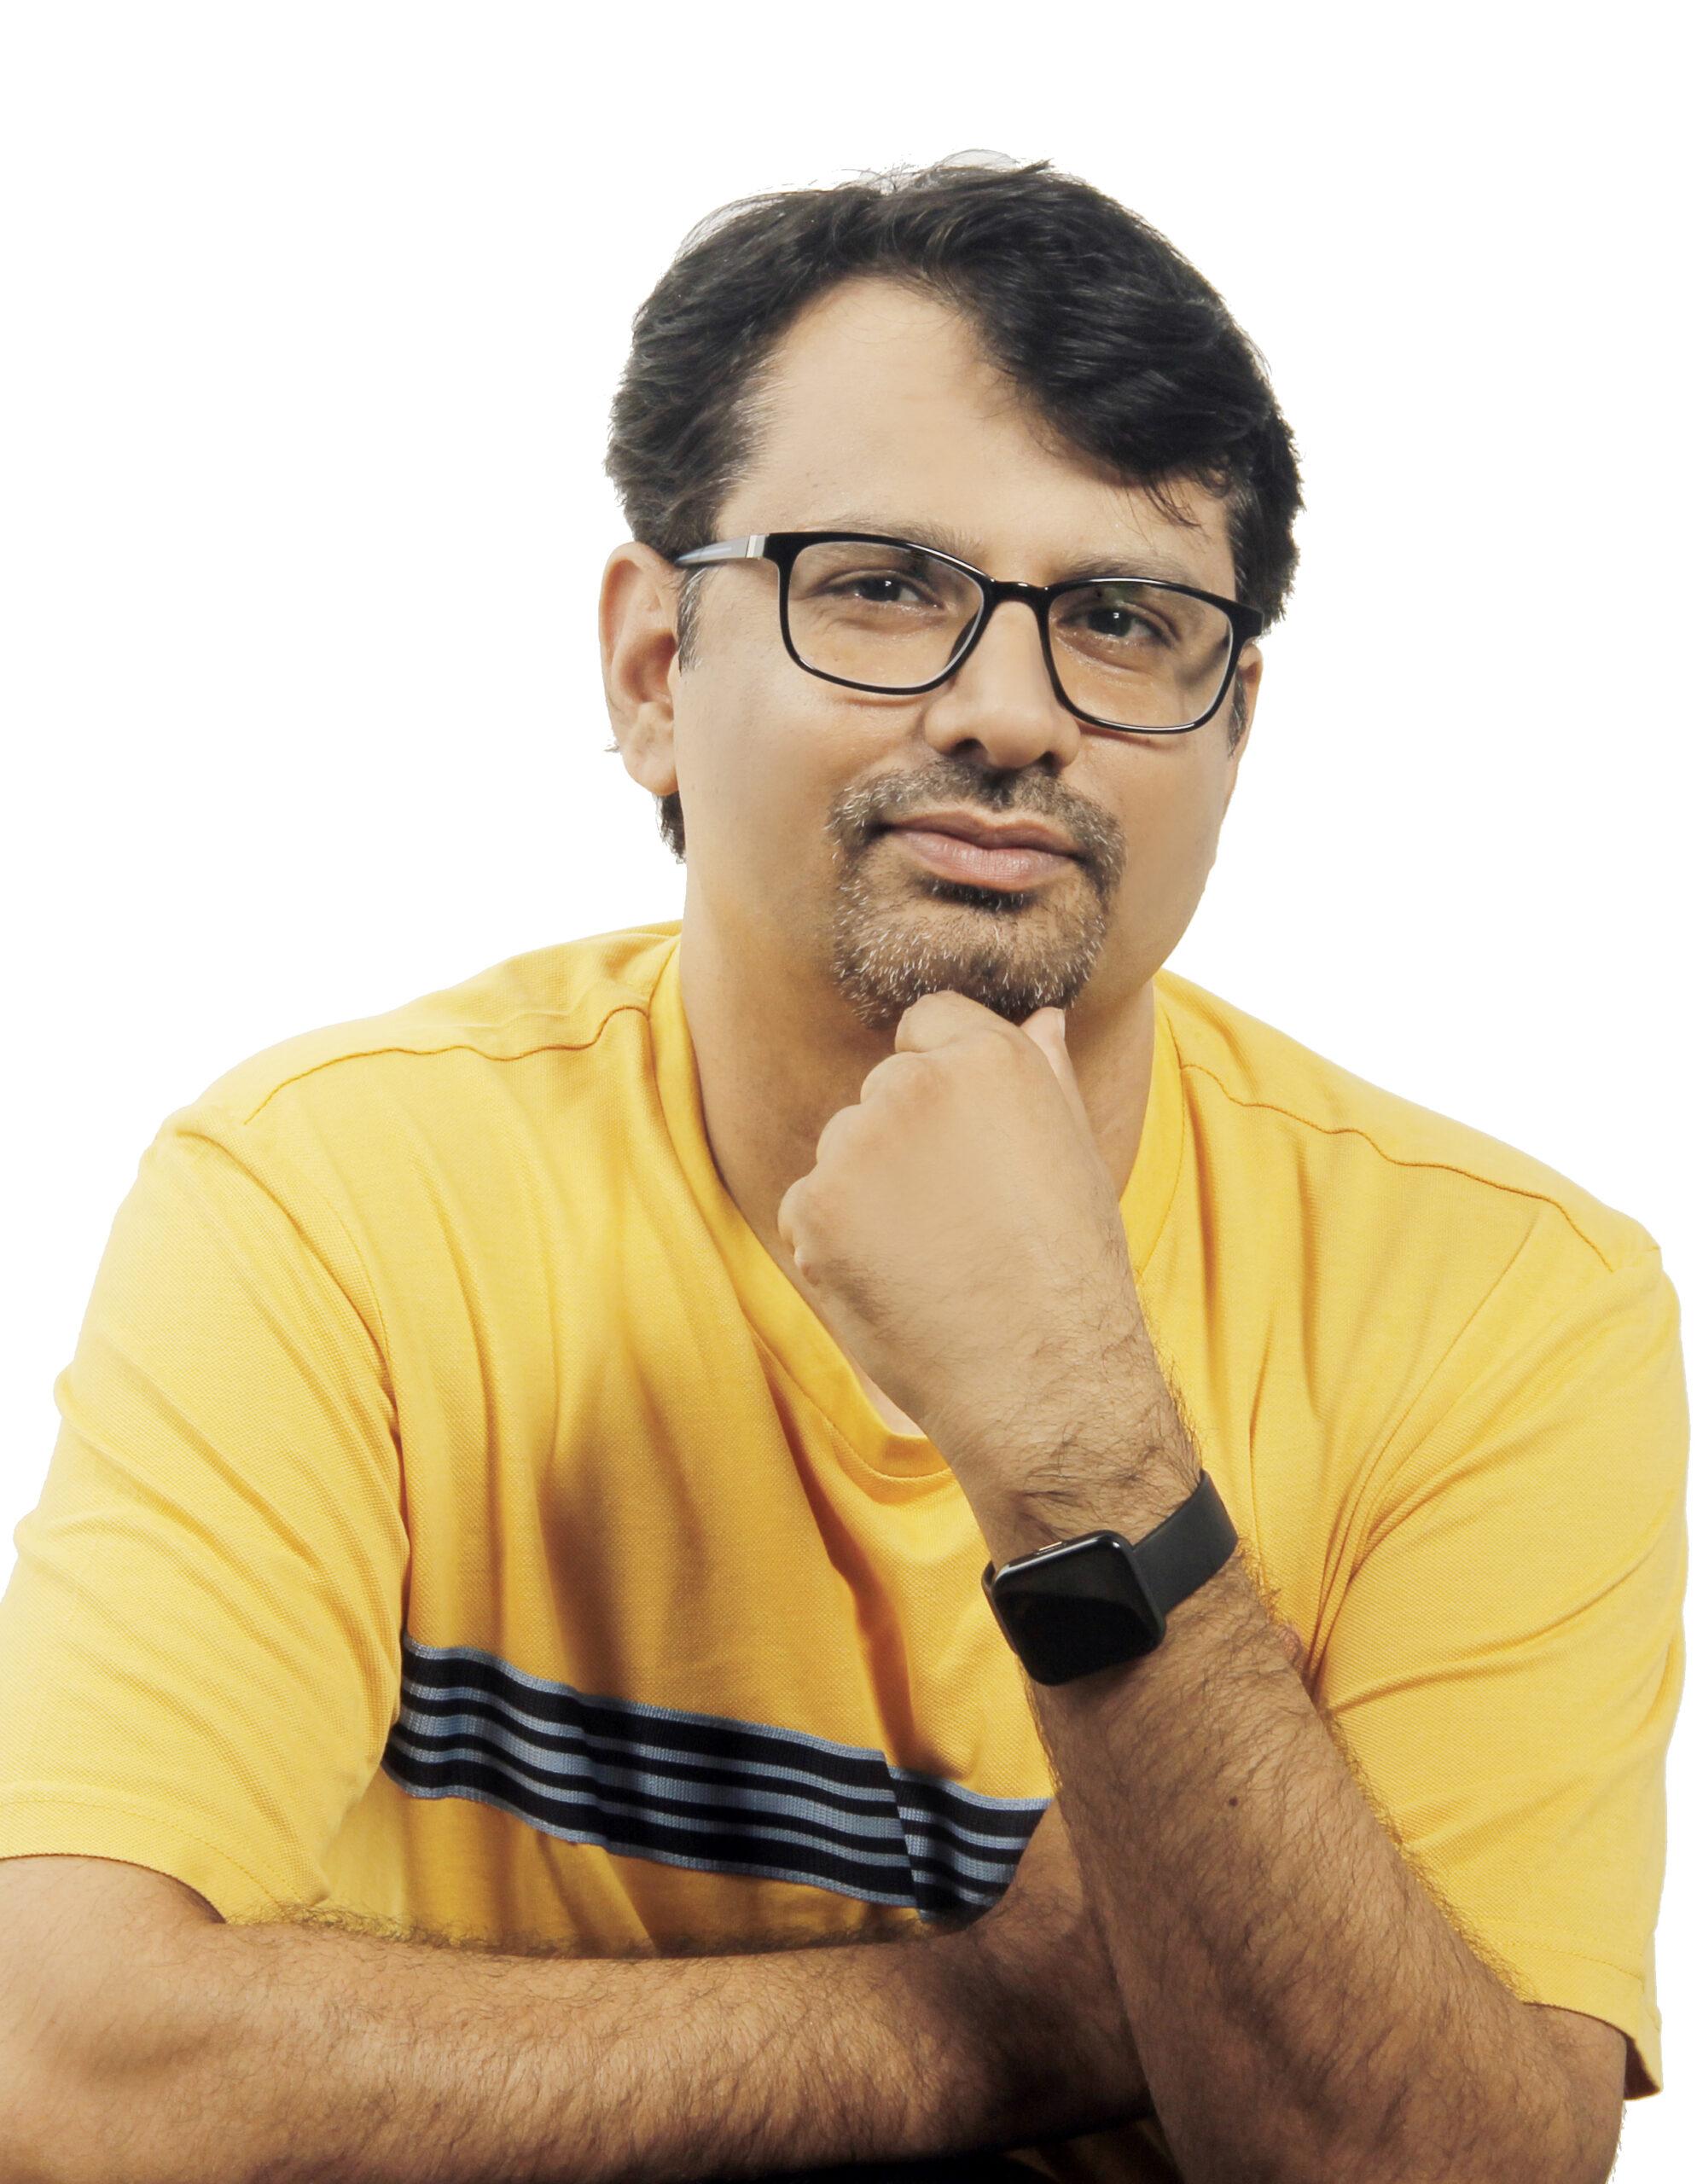 Dr. Gajendra Purohit: A Mathematics Tutor on YouTube from Udaipur